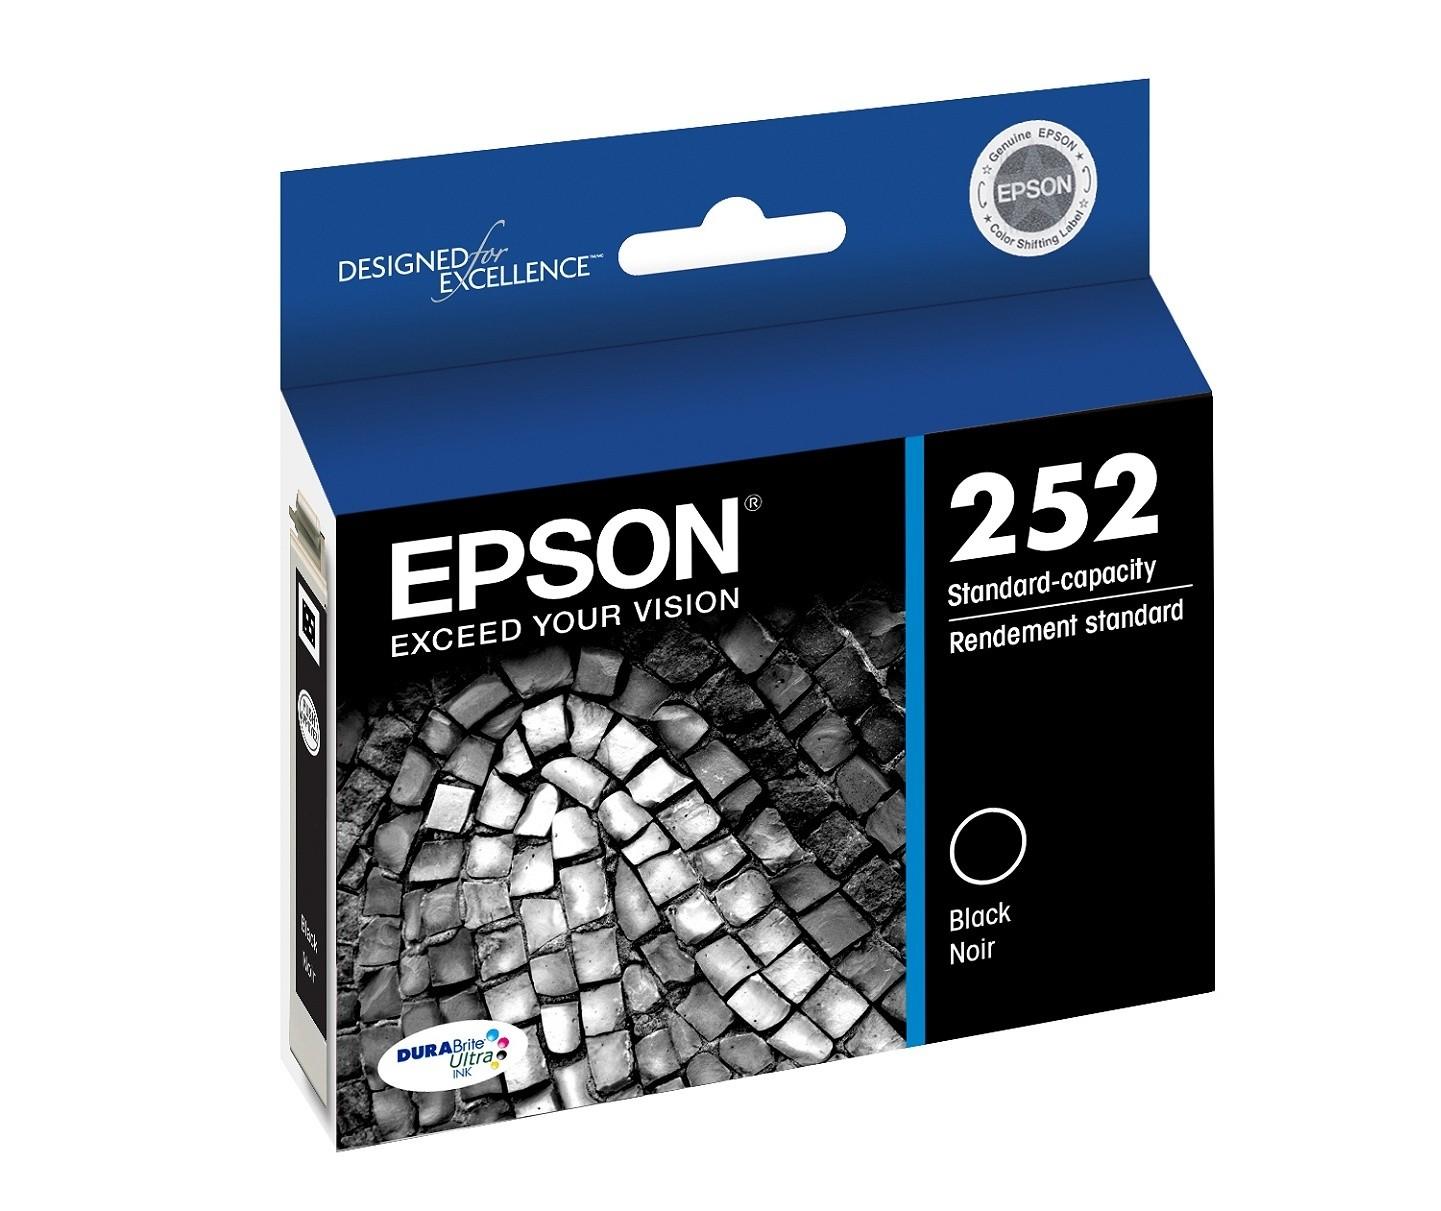 Epson DuraBrite 252 Ultra Standard-Capacity Black Ink Cartridge